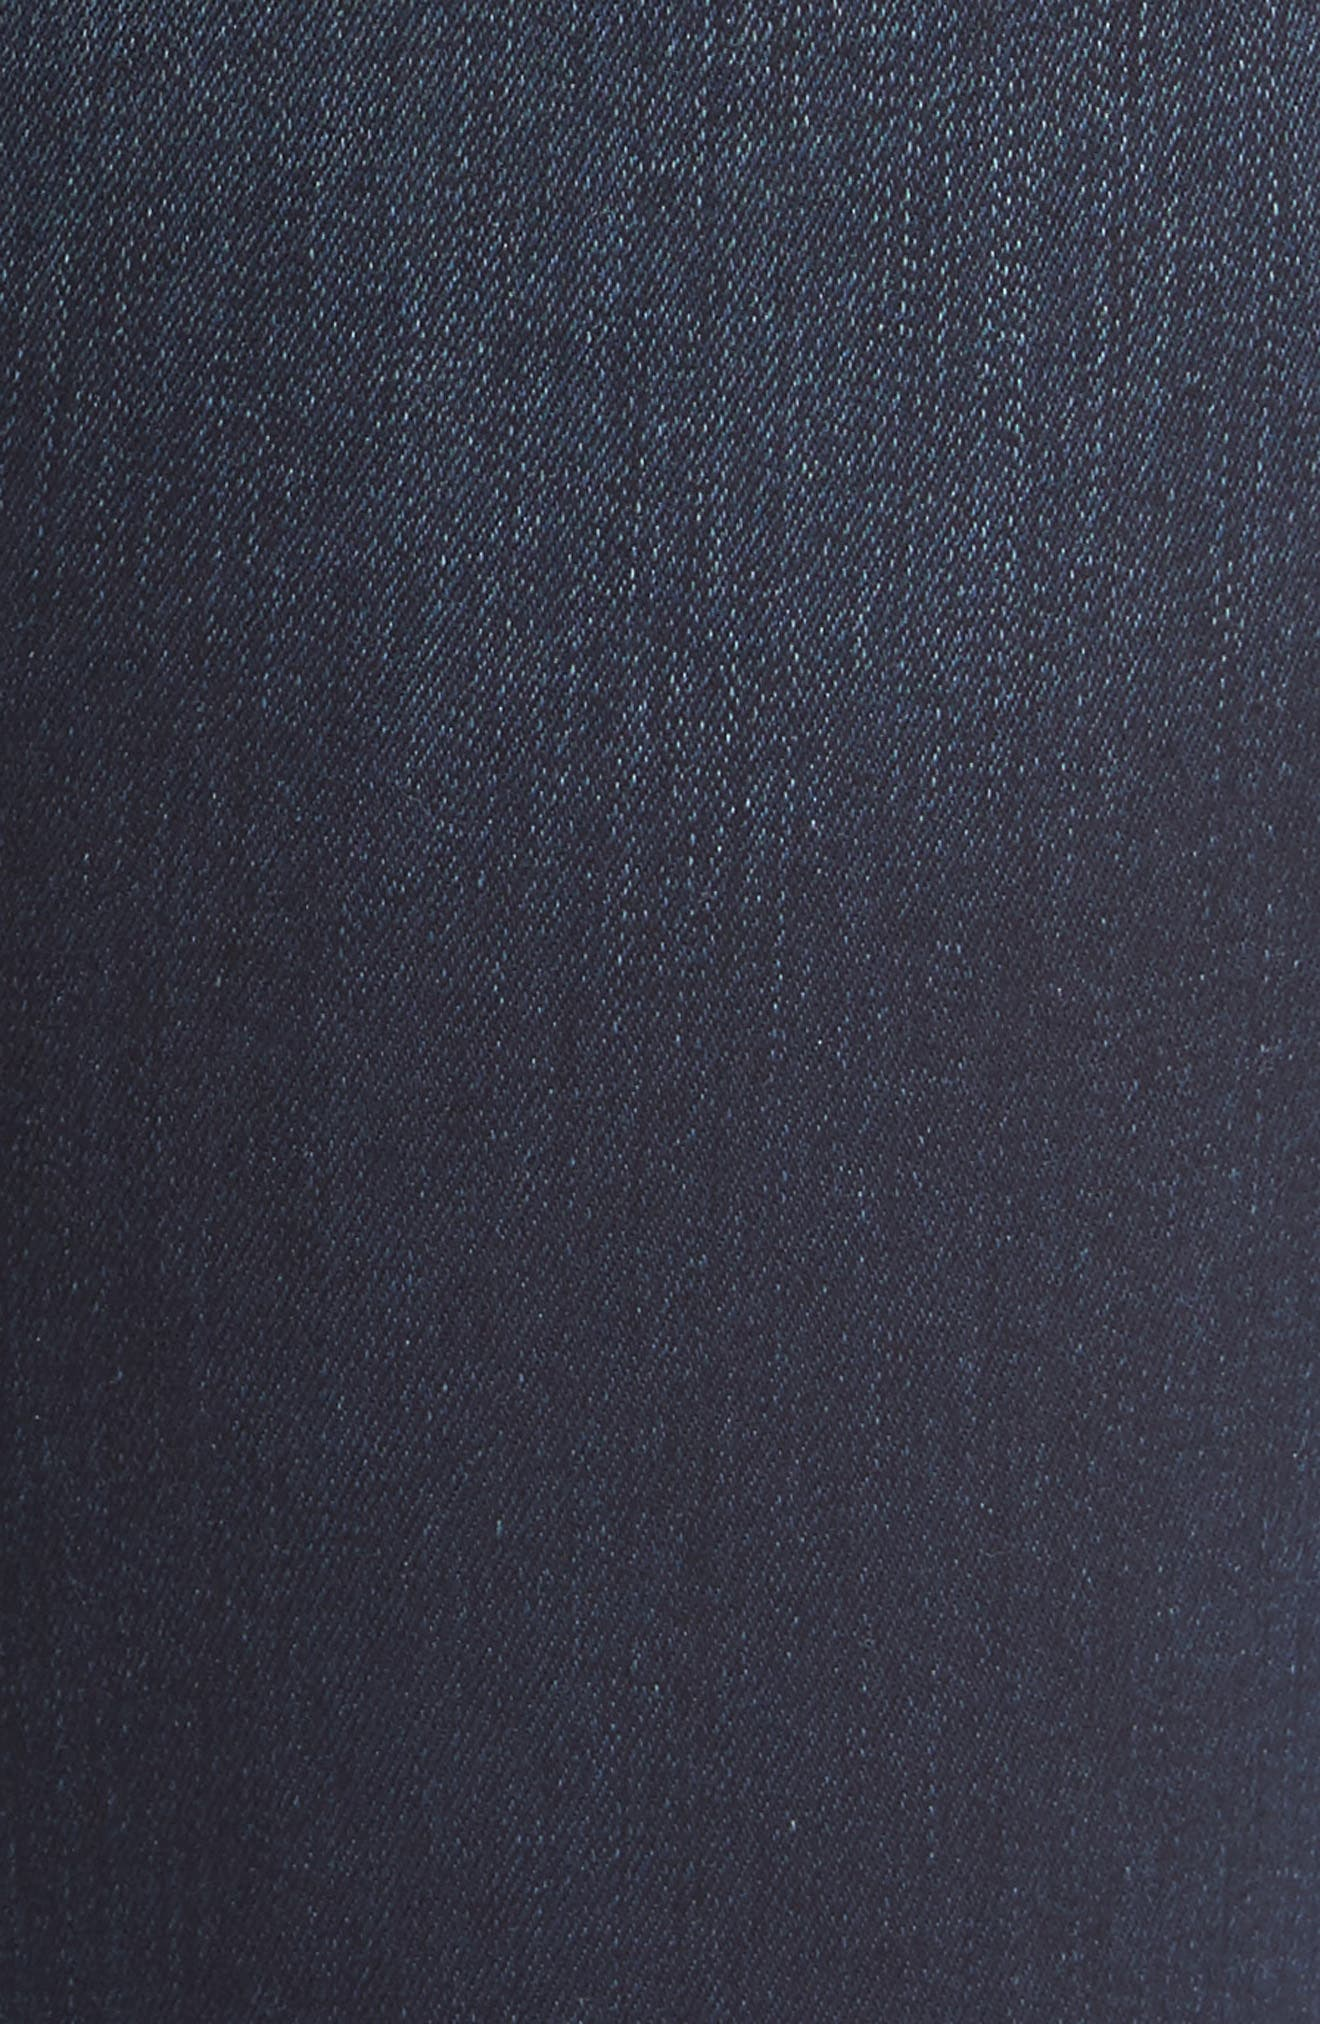 Newton Skinny Jeans,                             Alternate thumbnail 5, color,                             457